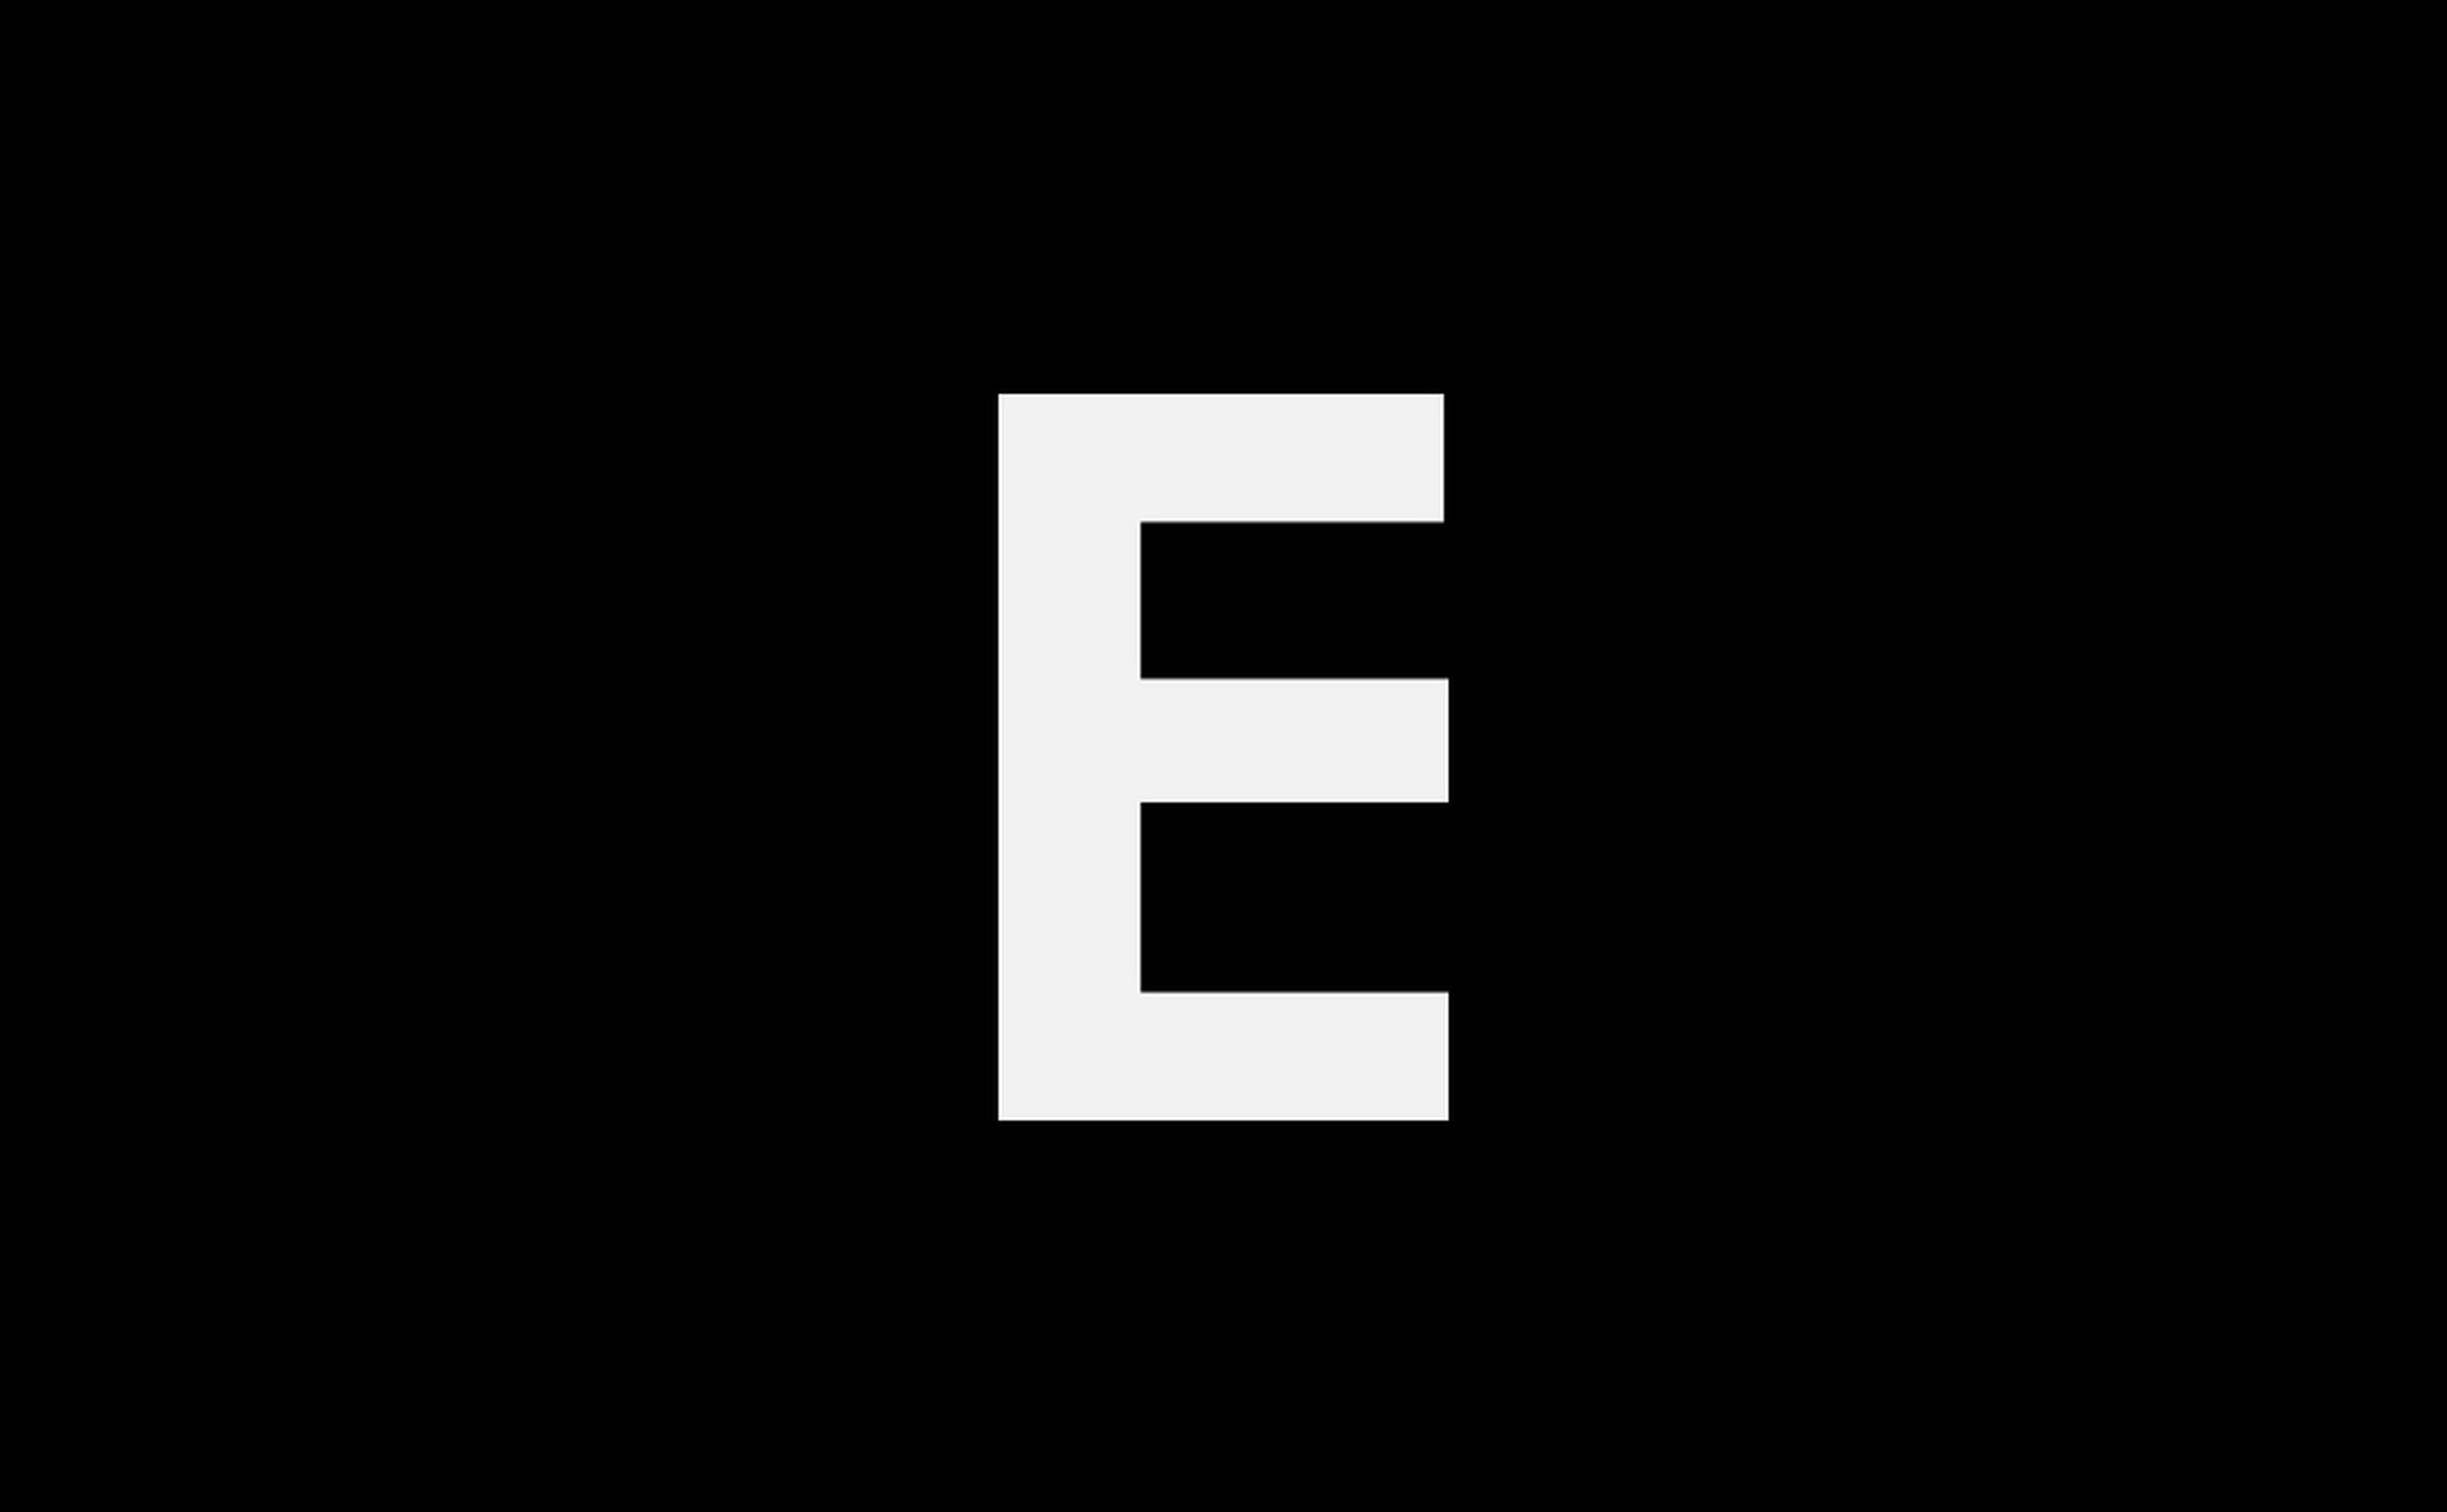 VIEW OF SUSPENSION BRIDGE IN BAY